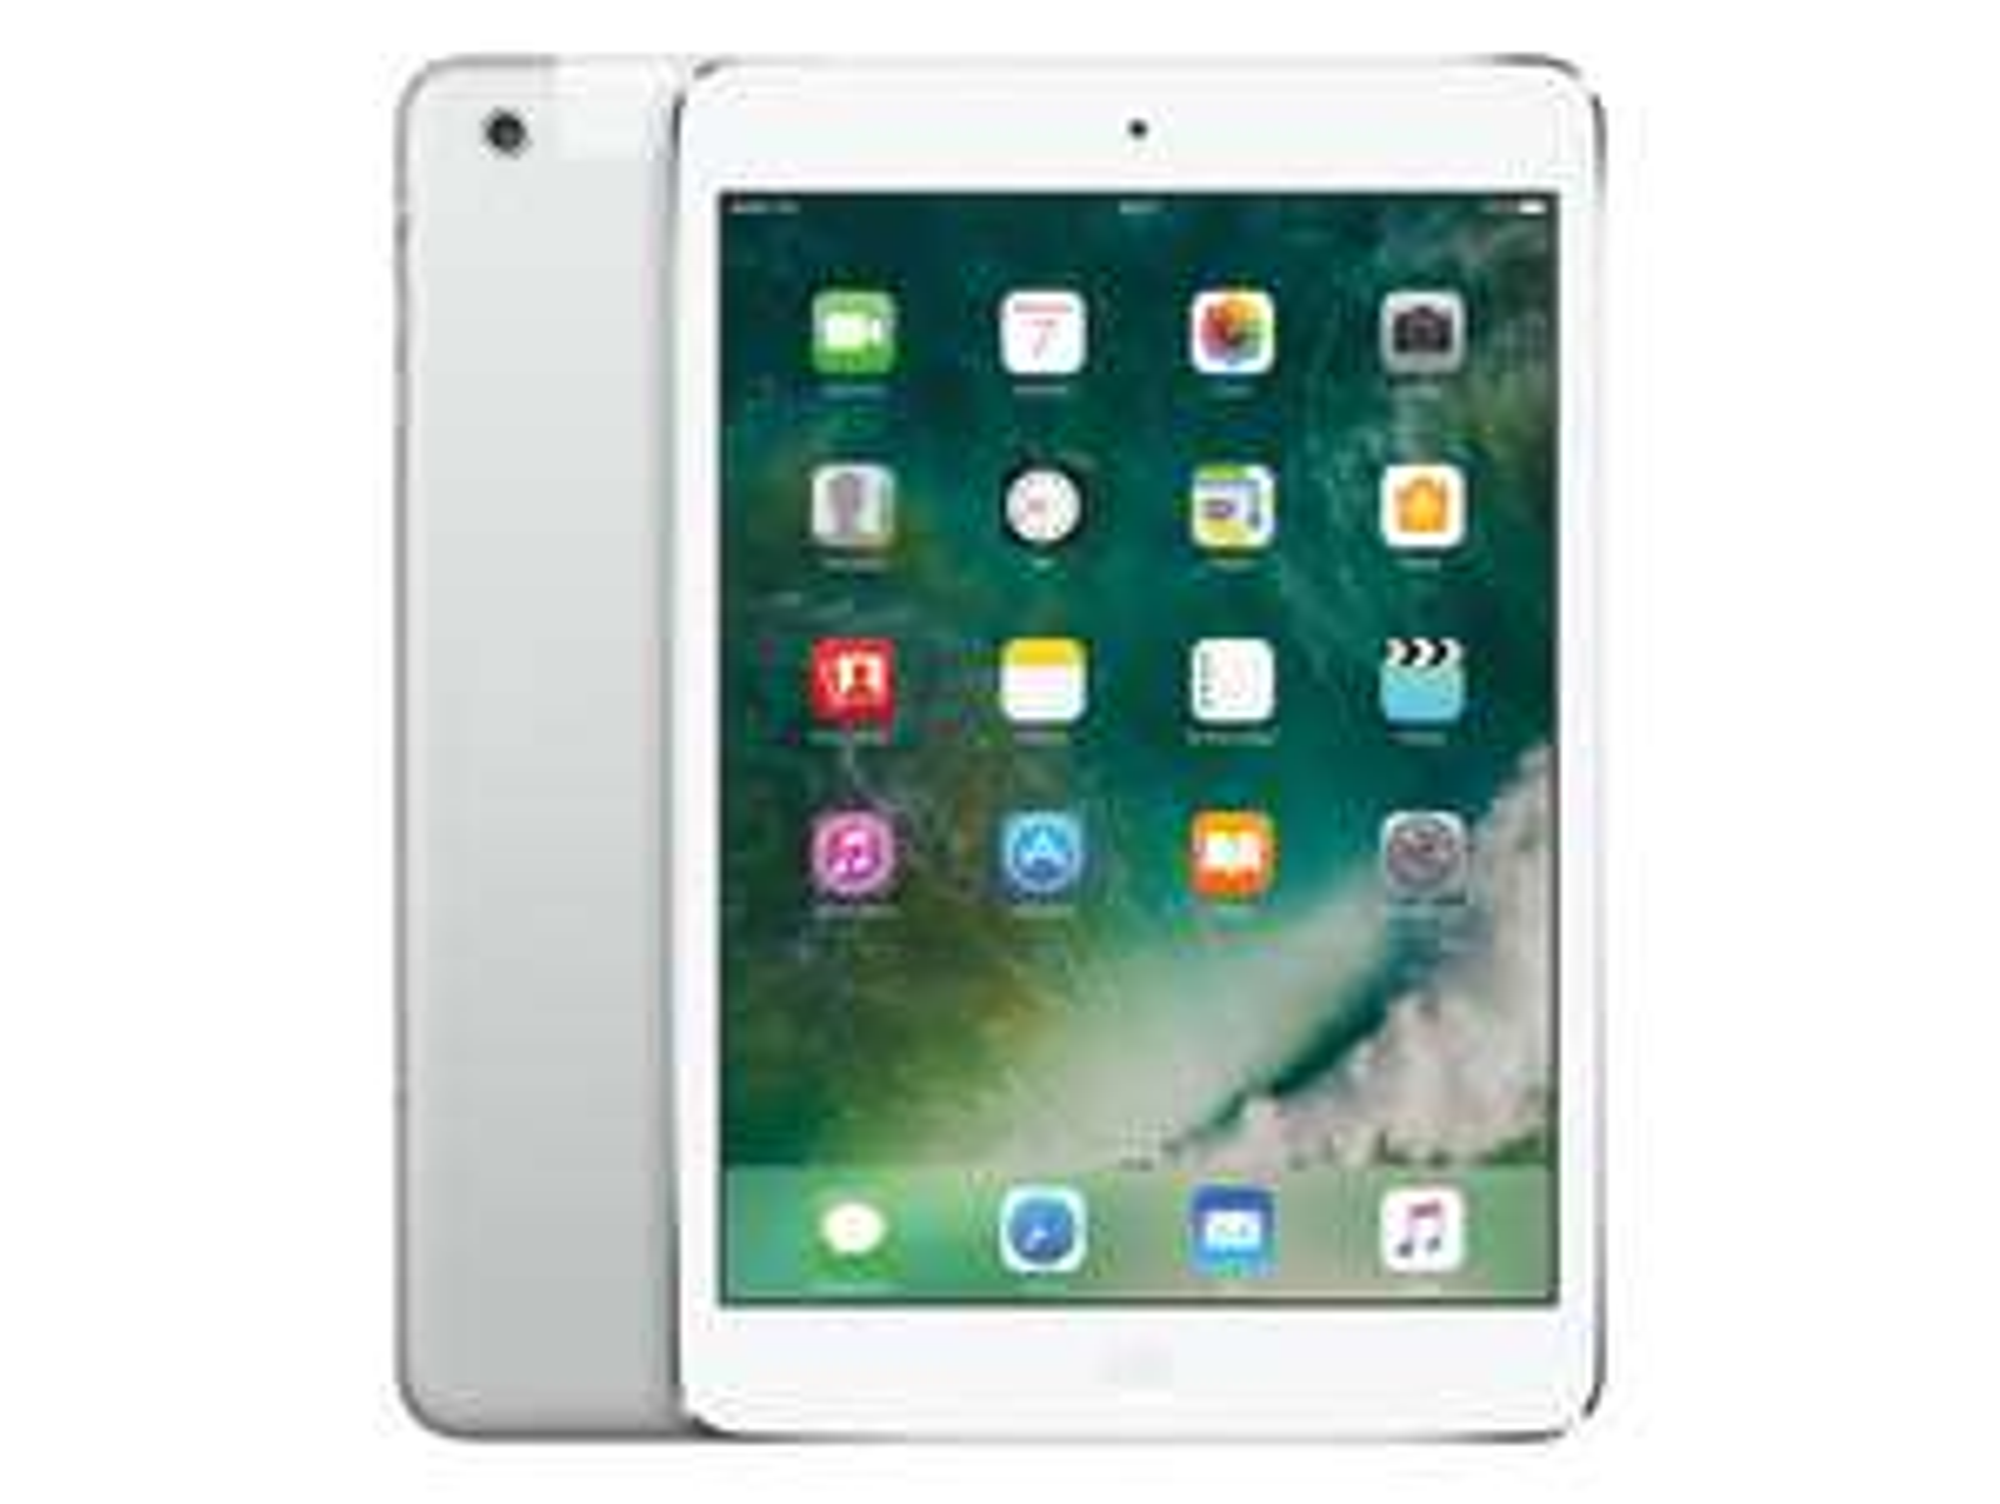 iPad mini 2 32GB Wifi + Cellular silber für 249€ bei Gravis (Pvg: 379€)